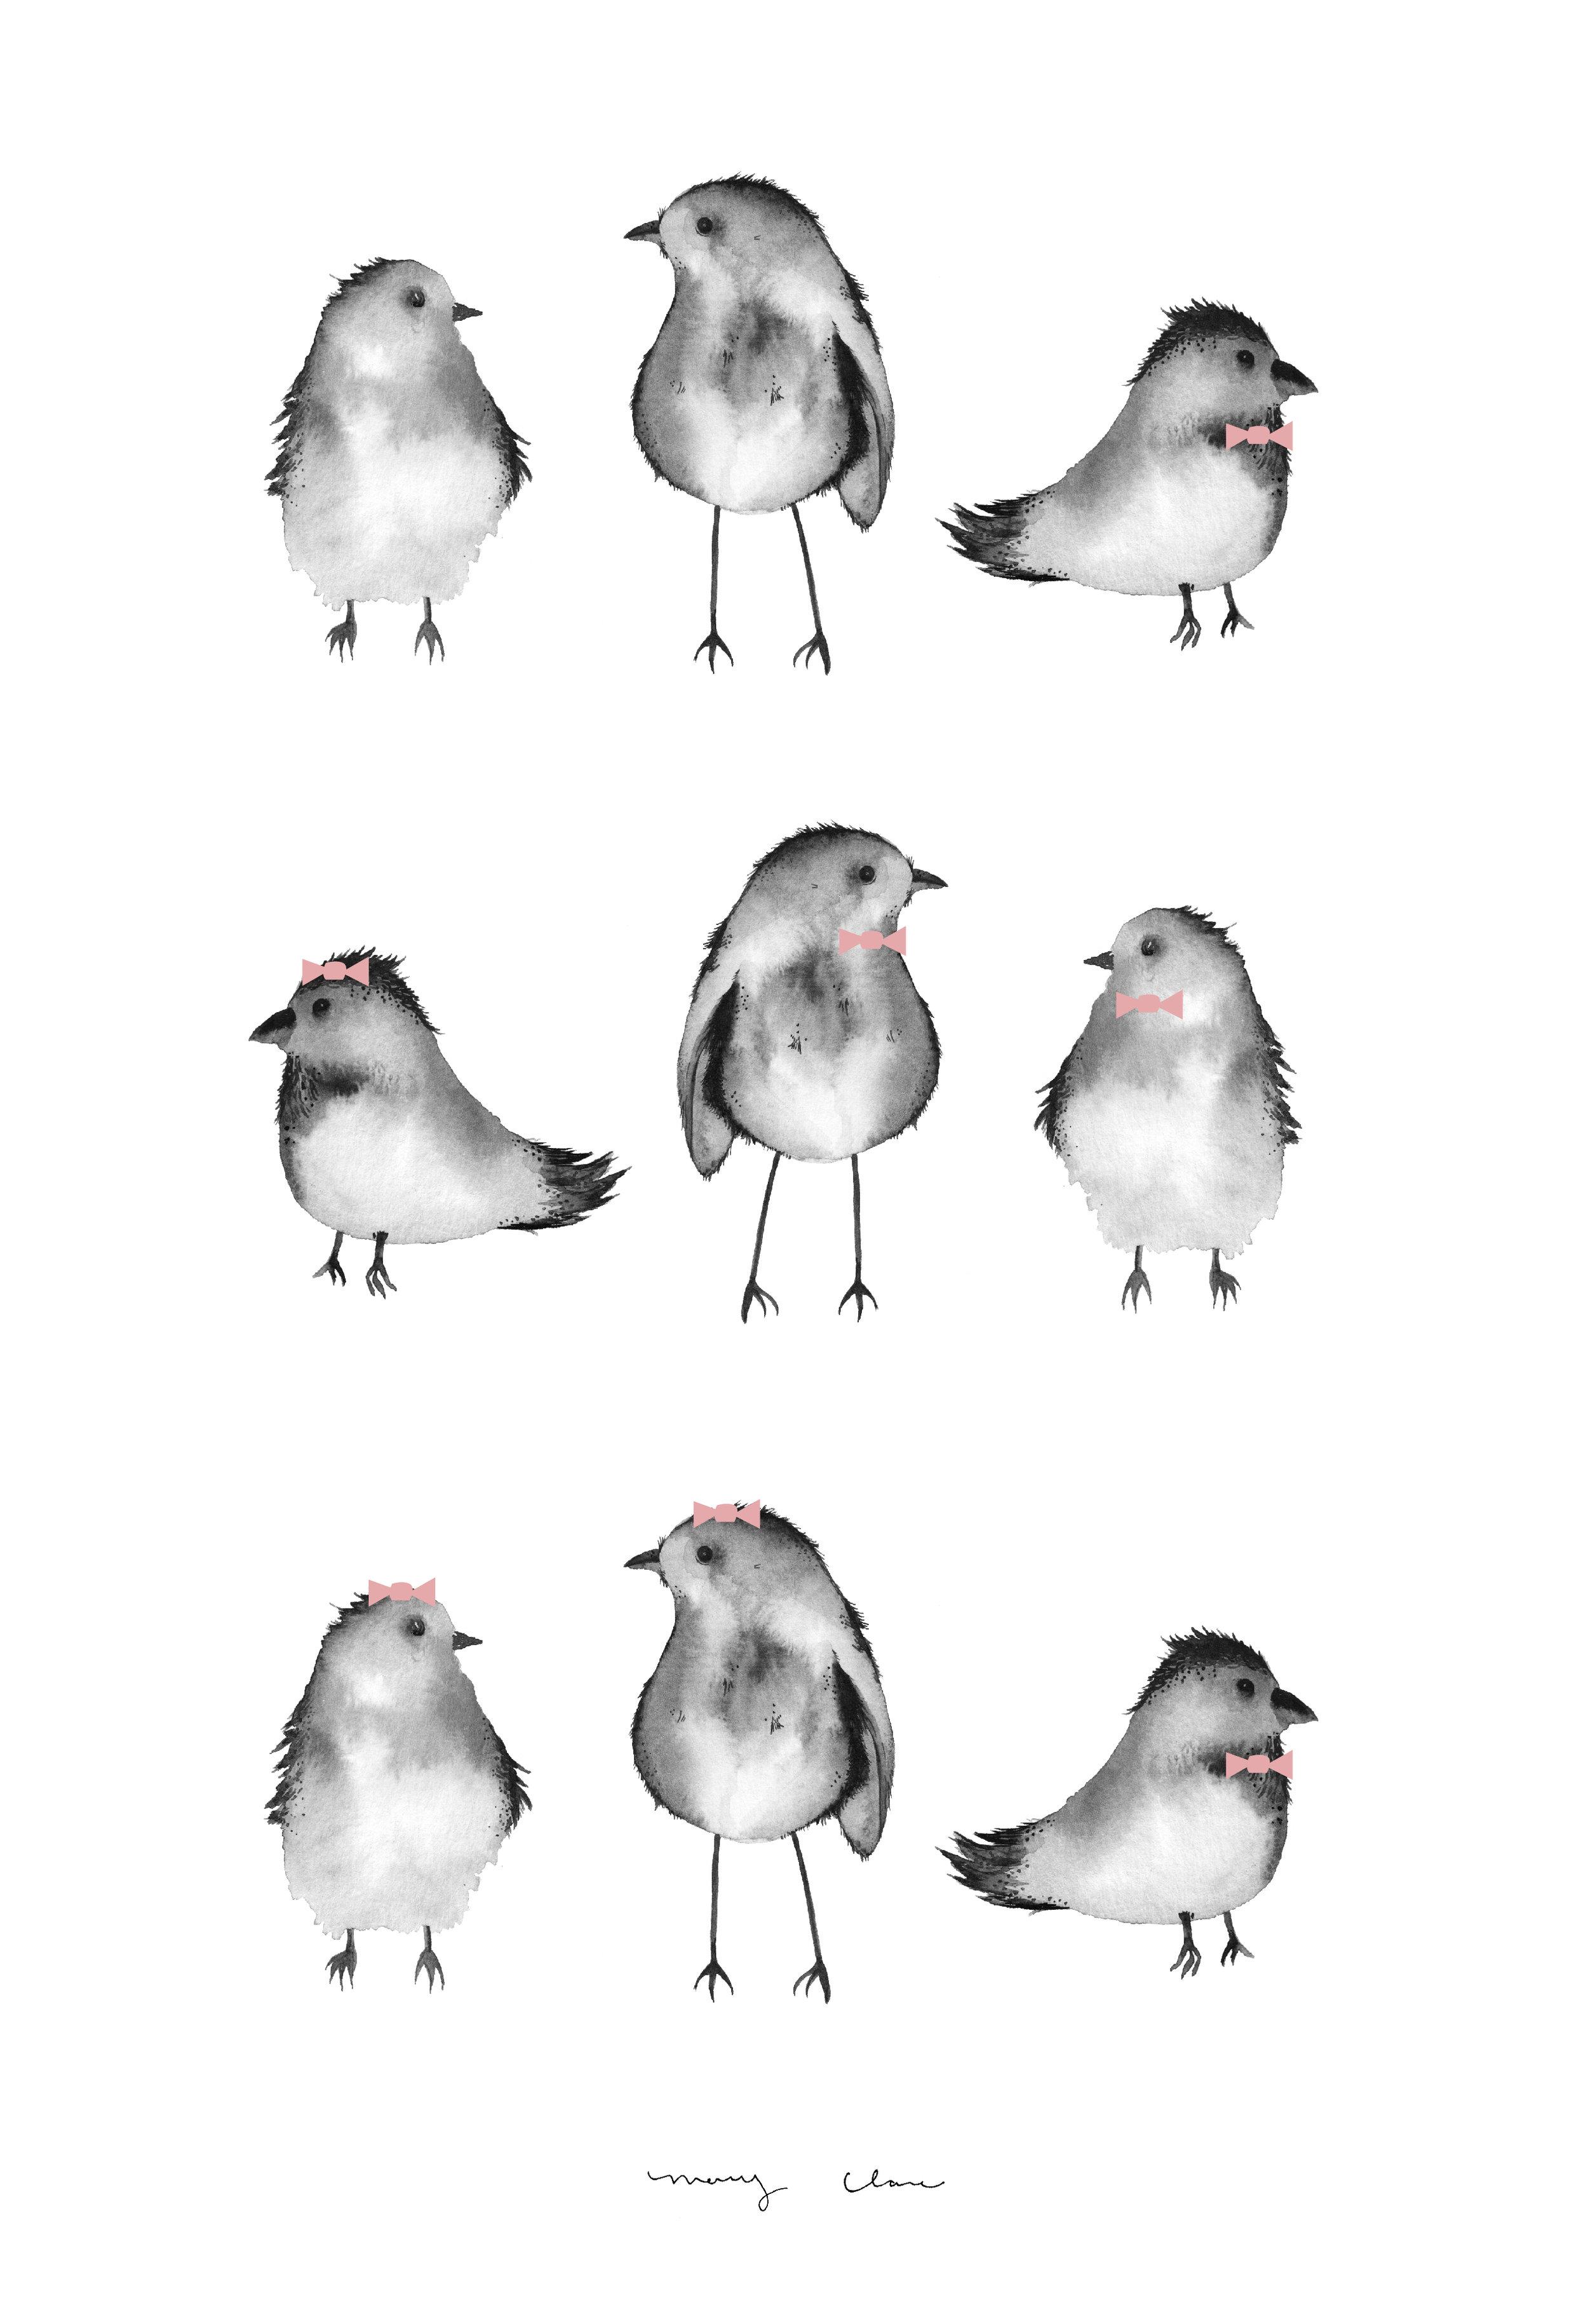 woodlandBirds-maryclarewilkie-02.jpg